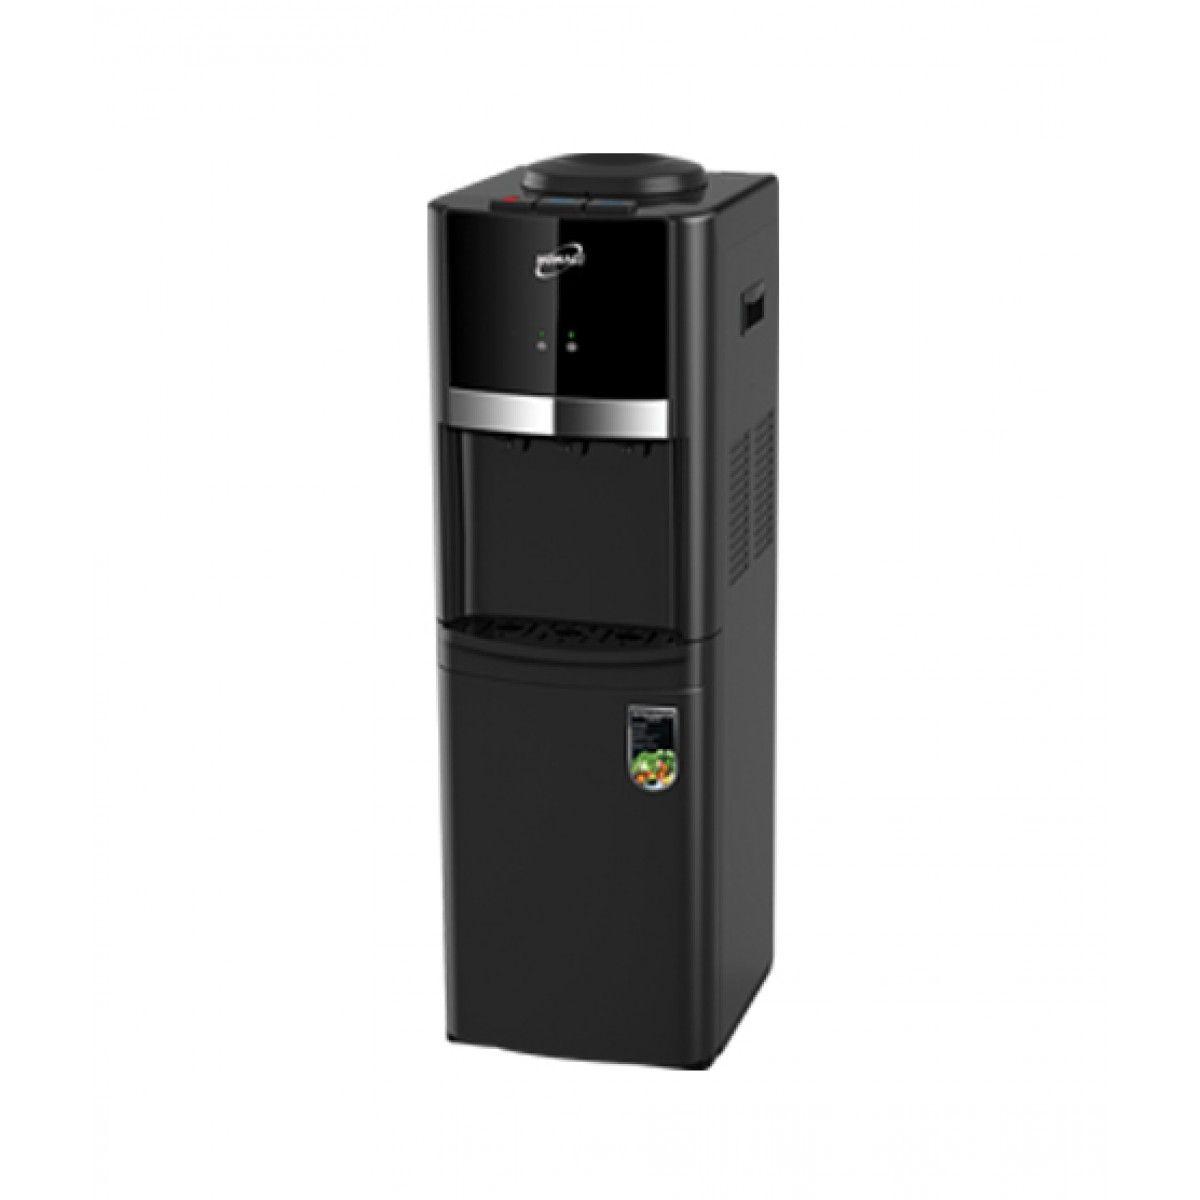 Homage HWD-42 3 Taps Water Dispenser